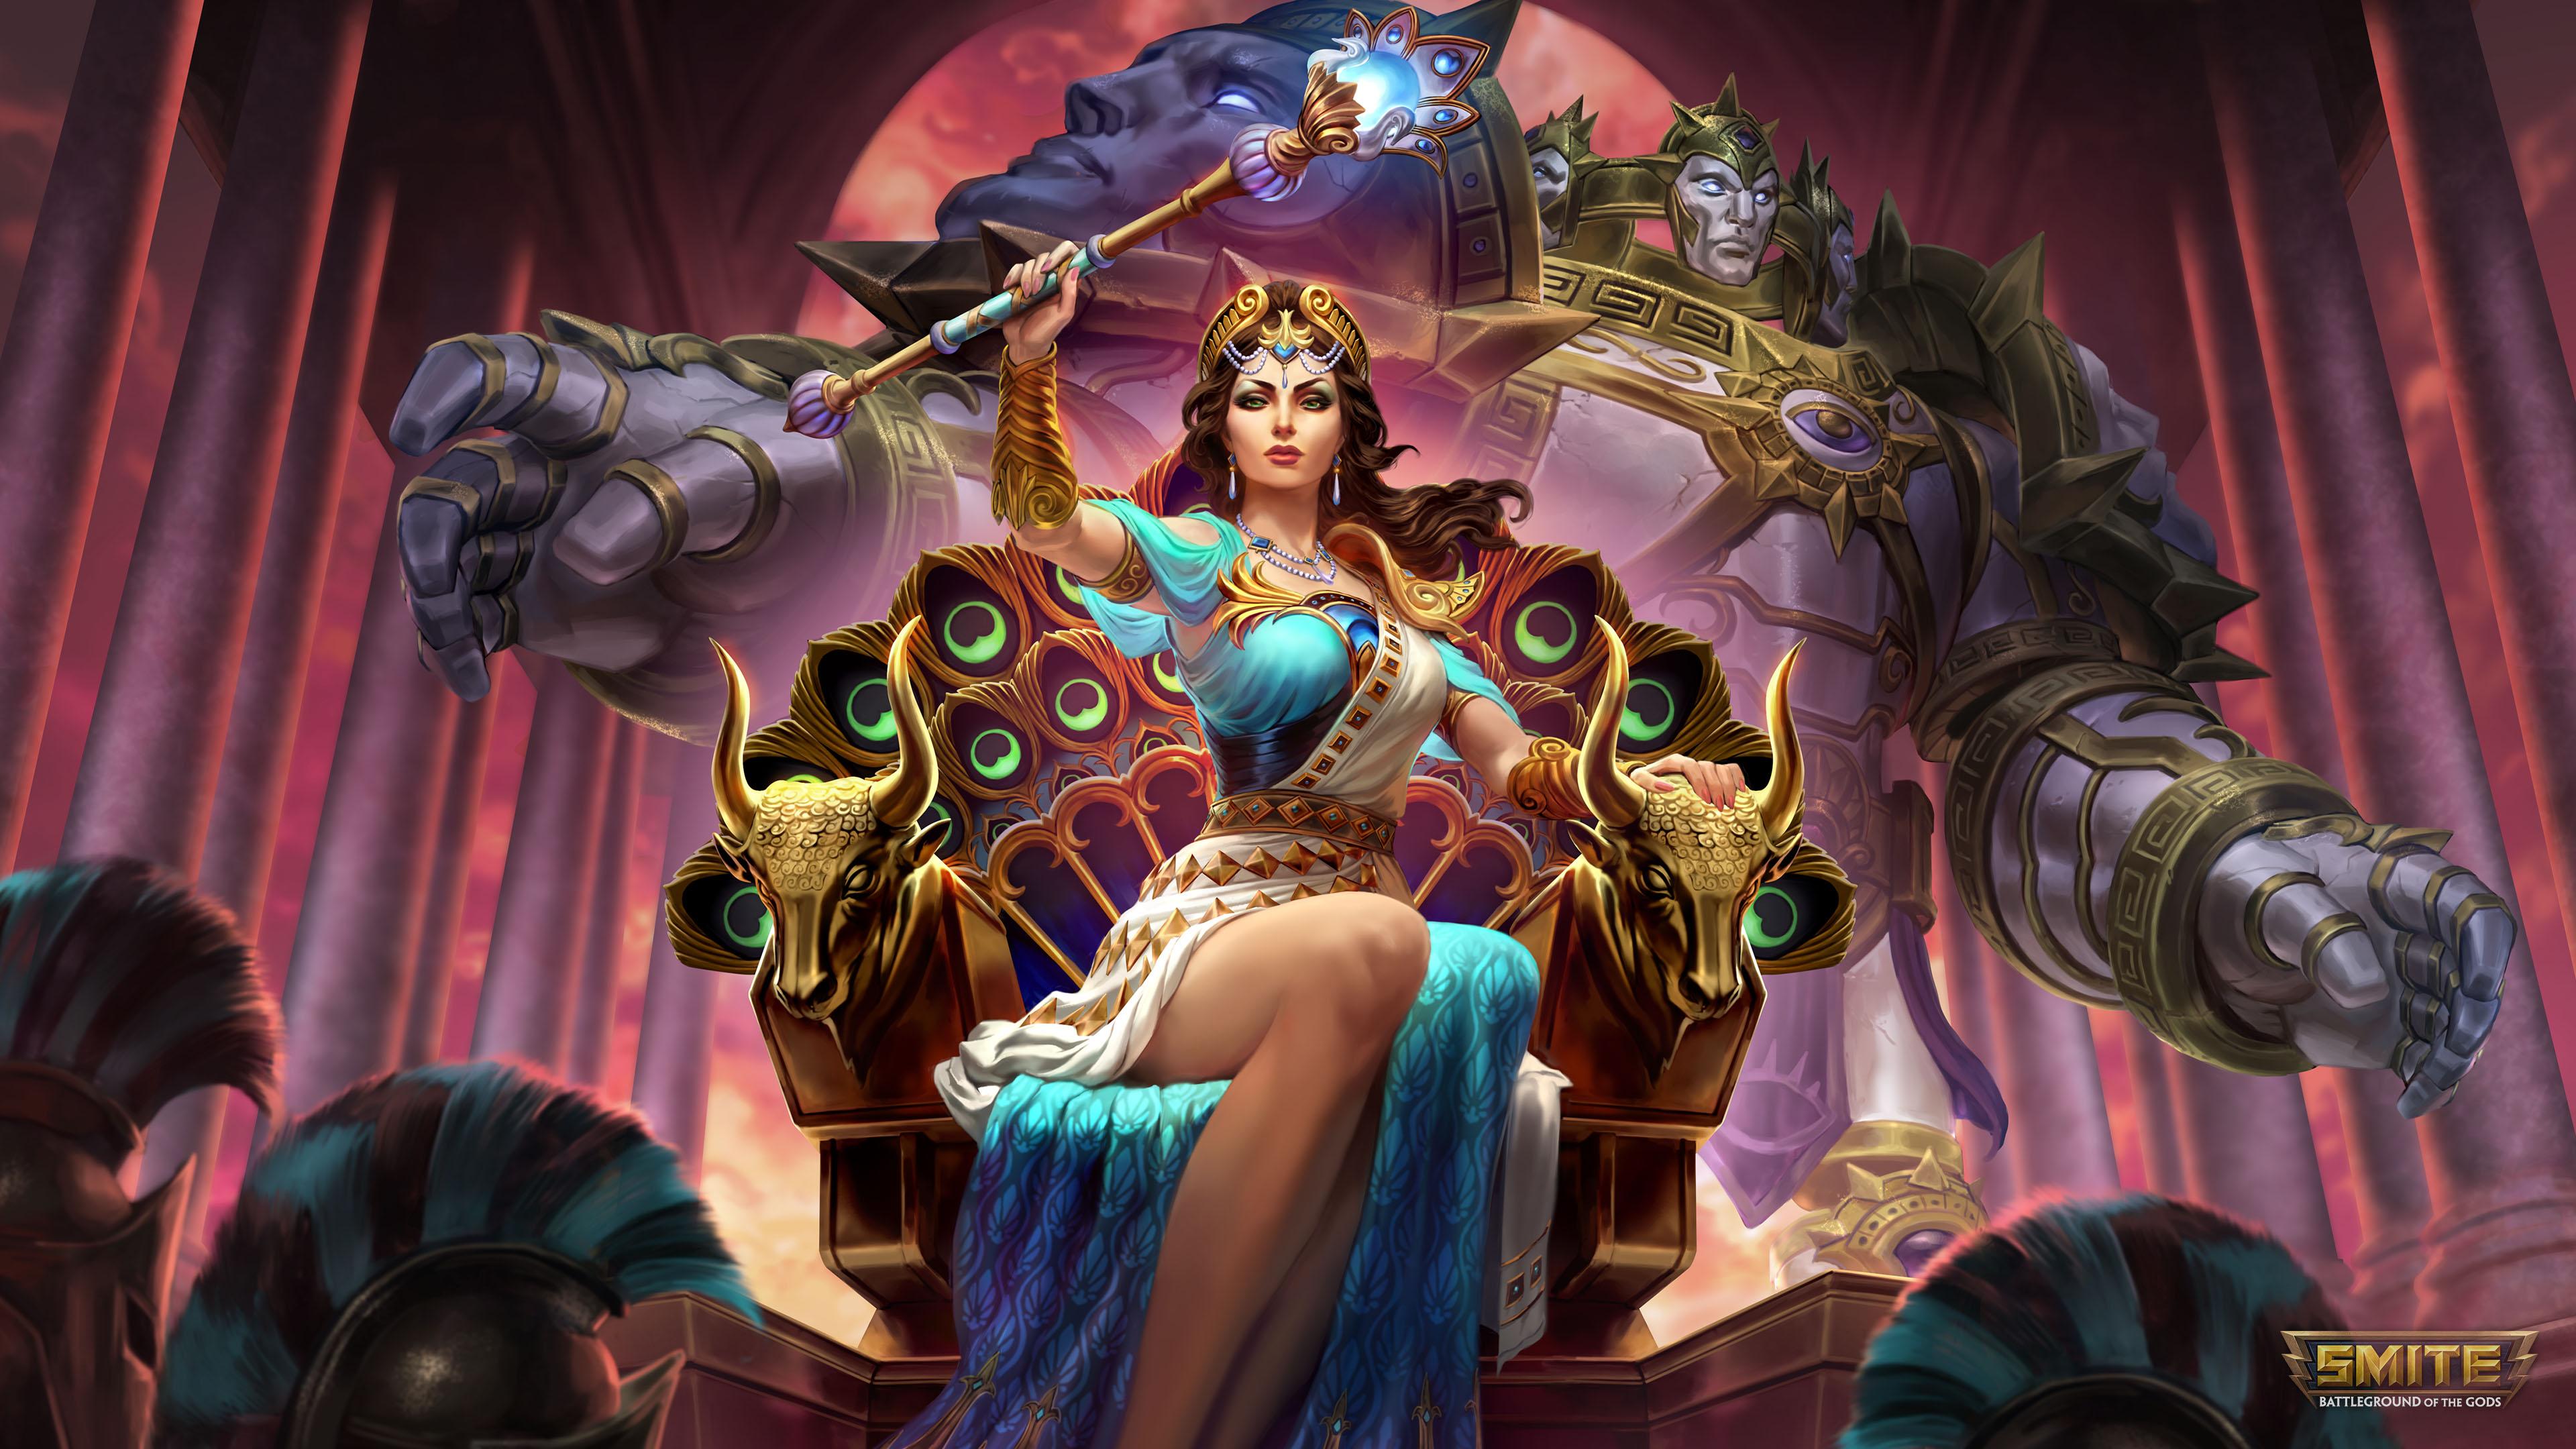 hera queen of the gods 4k 1540982600 - Hera Queen Of The Gods 4k - smite wallpapers, hd-wallpapers, games wallpapers, 4k-wallpapers